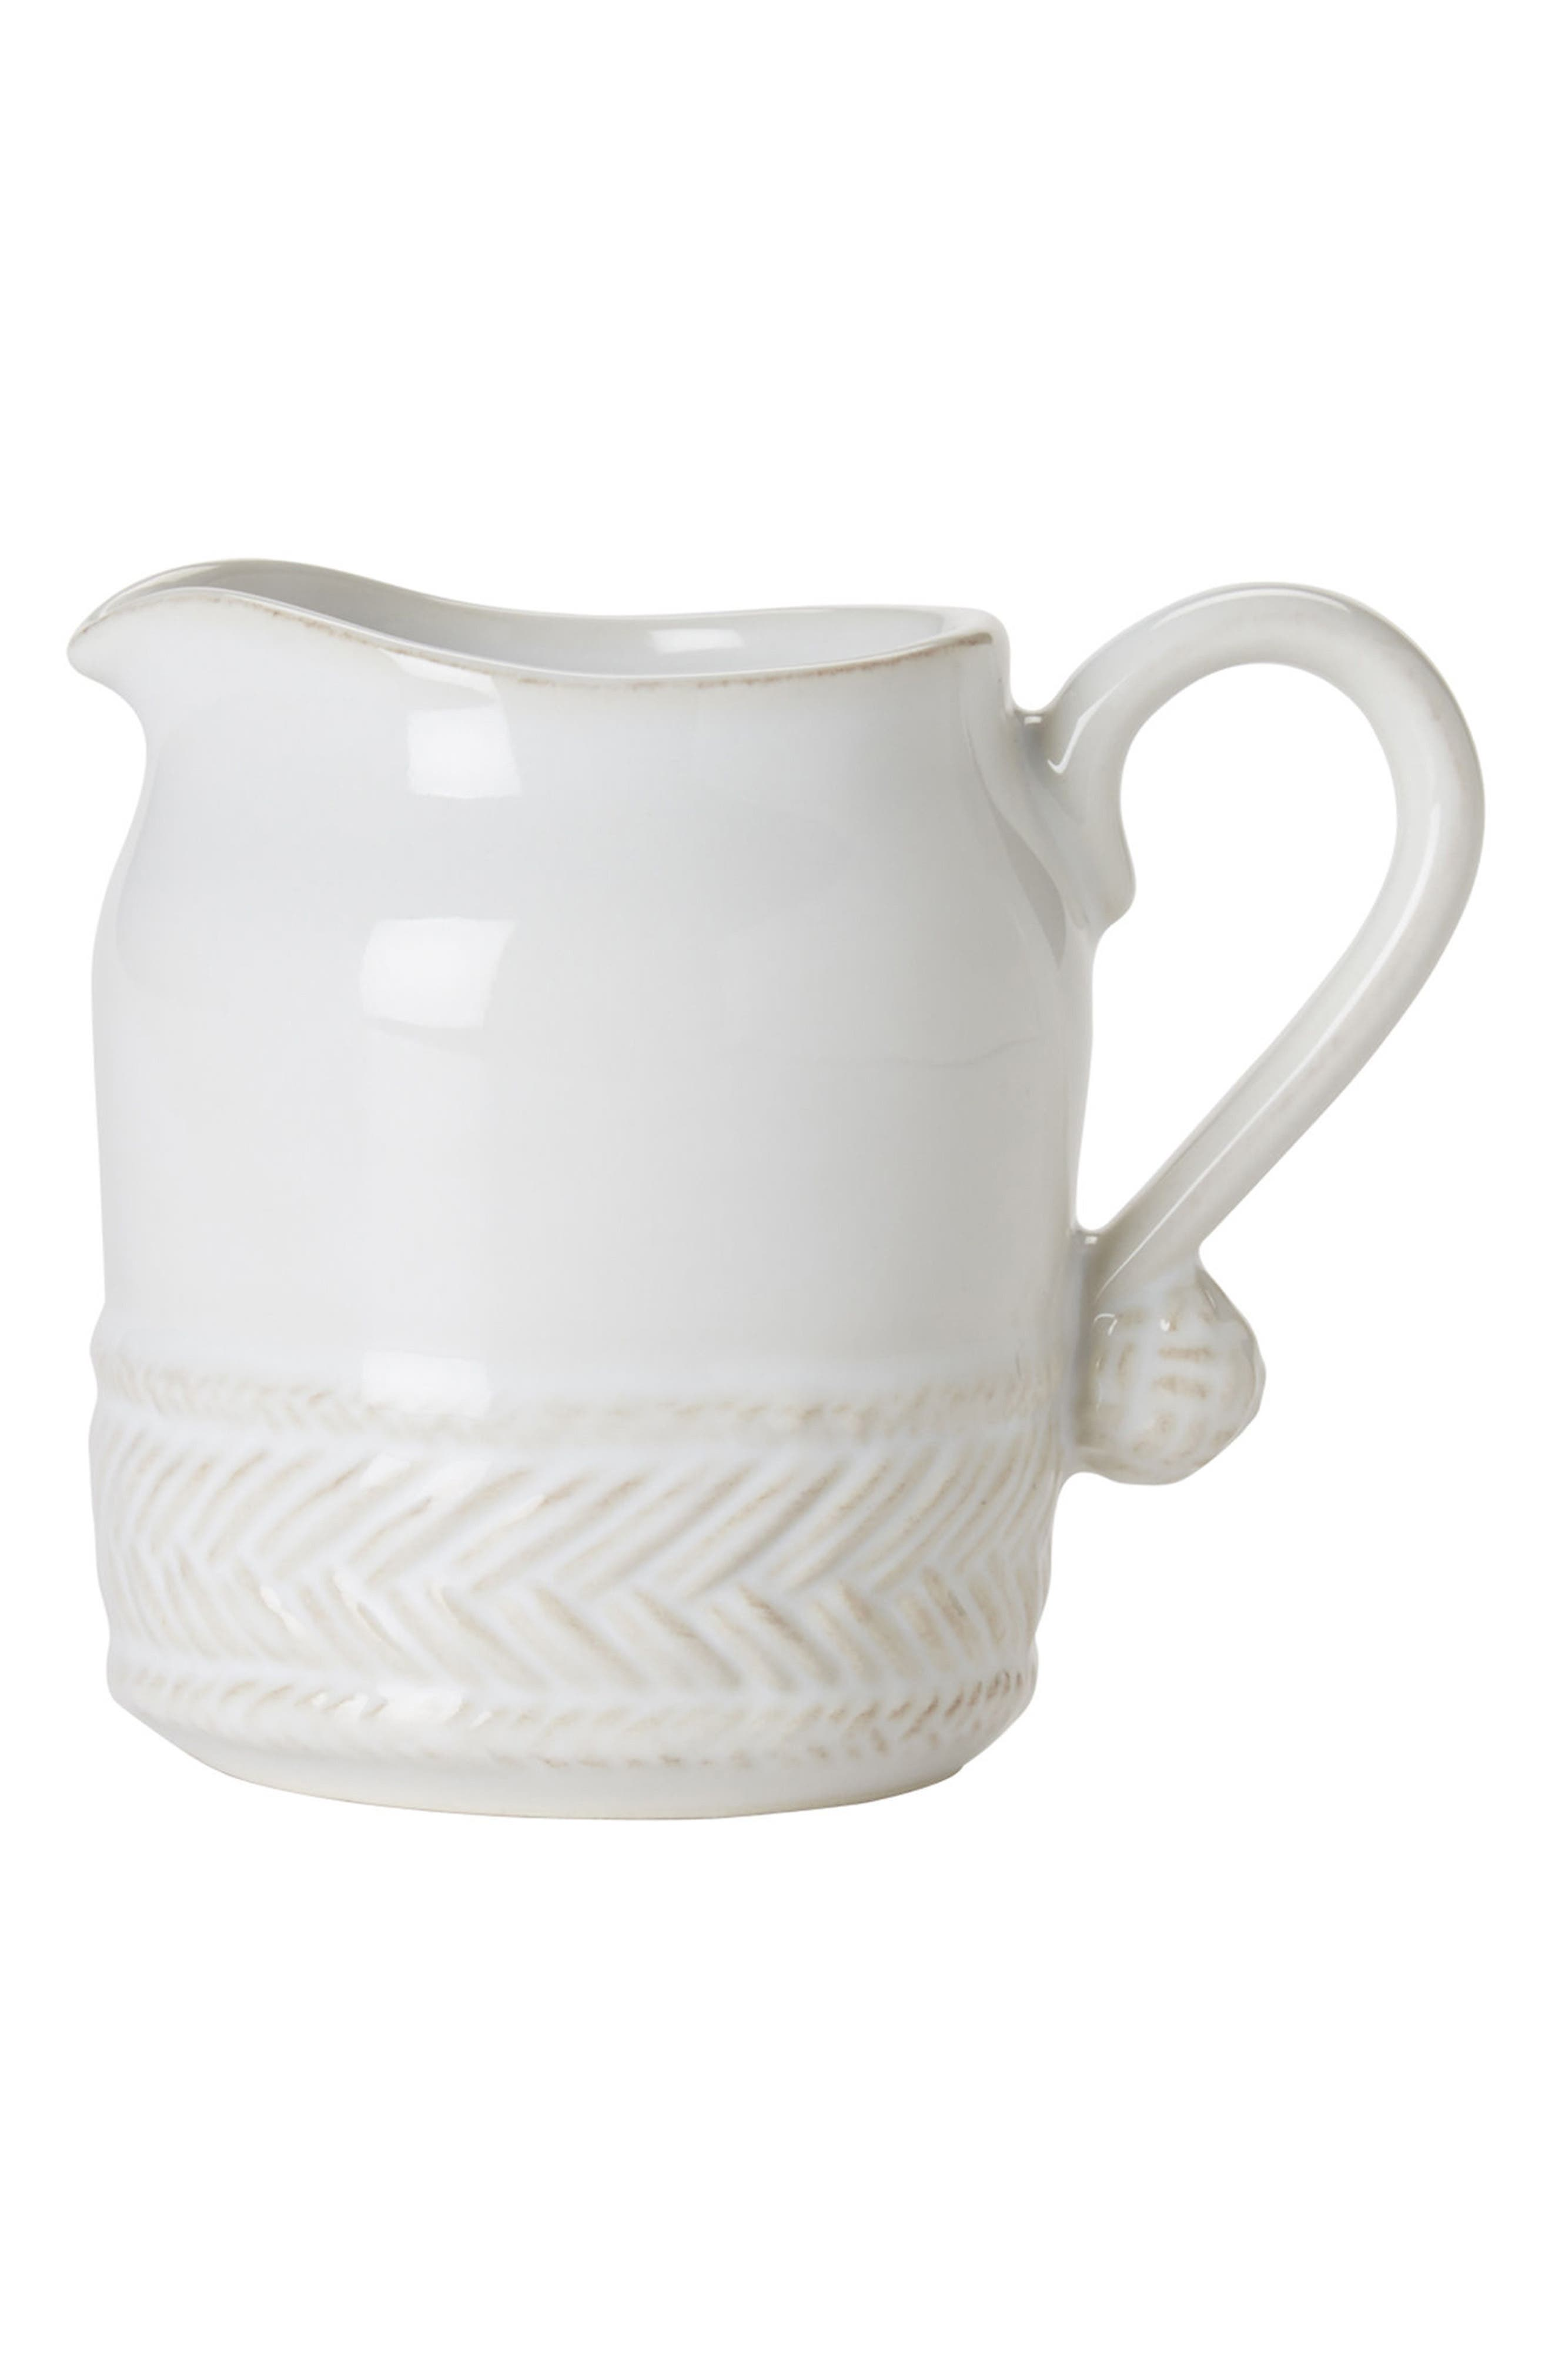 Le Panier Ceramic Creamer,                         Main,                         color, WHITEWASH